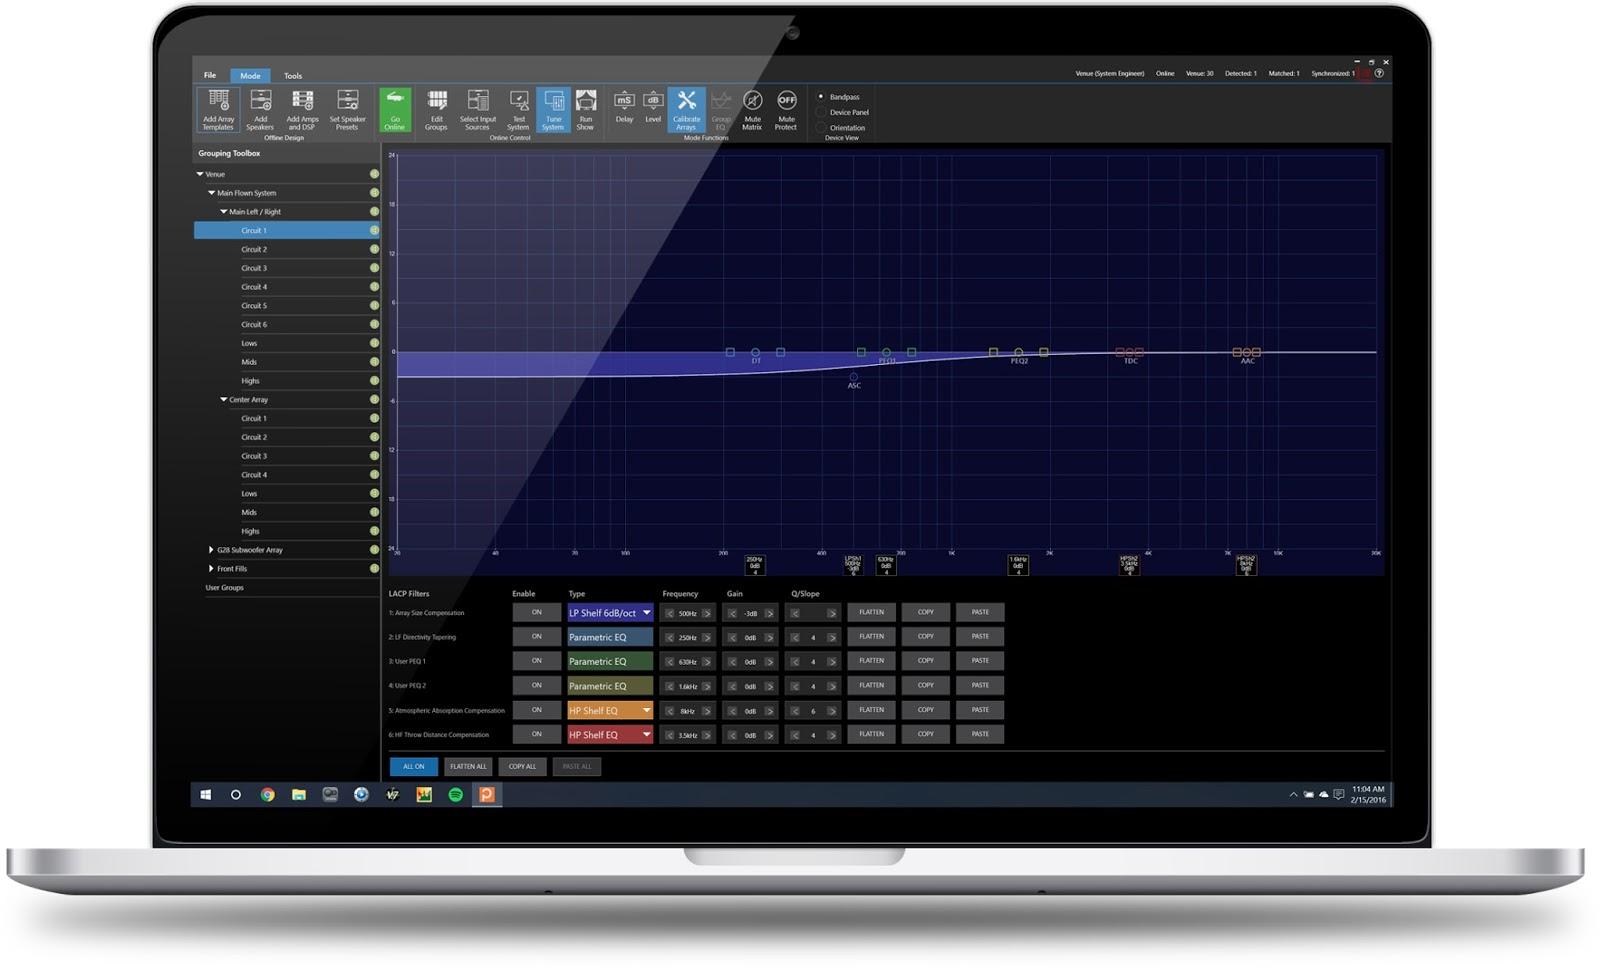 JBL HiQnet Performance Manager